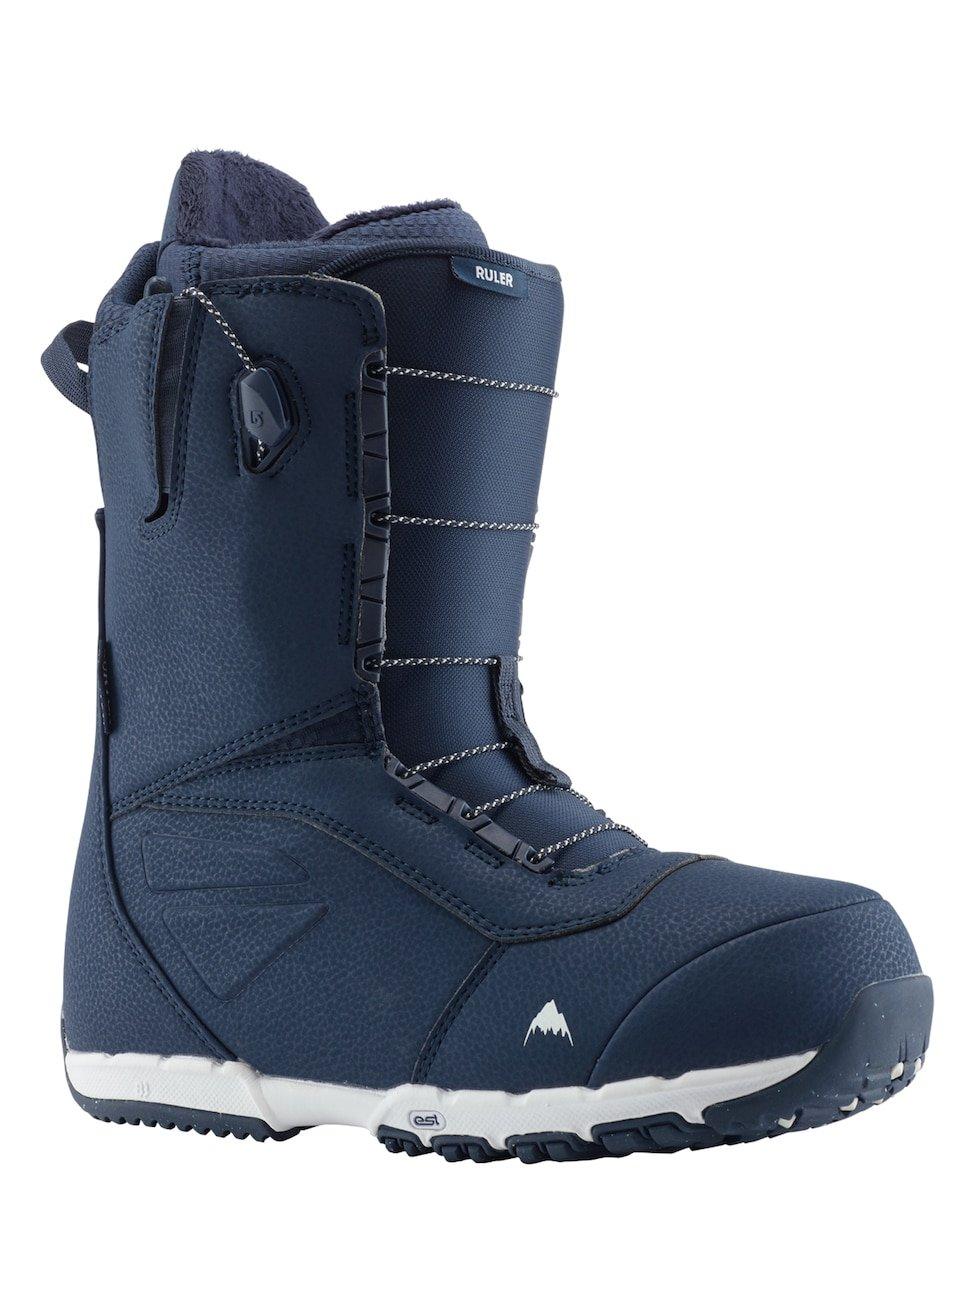 Burton RULER boots de Snowboard 2019-1